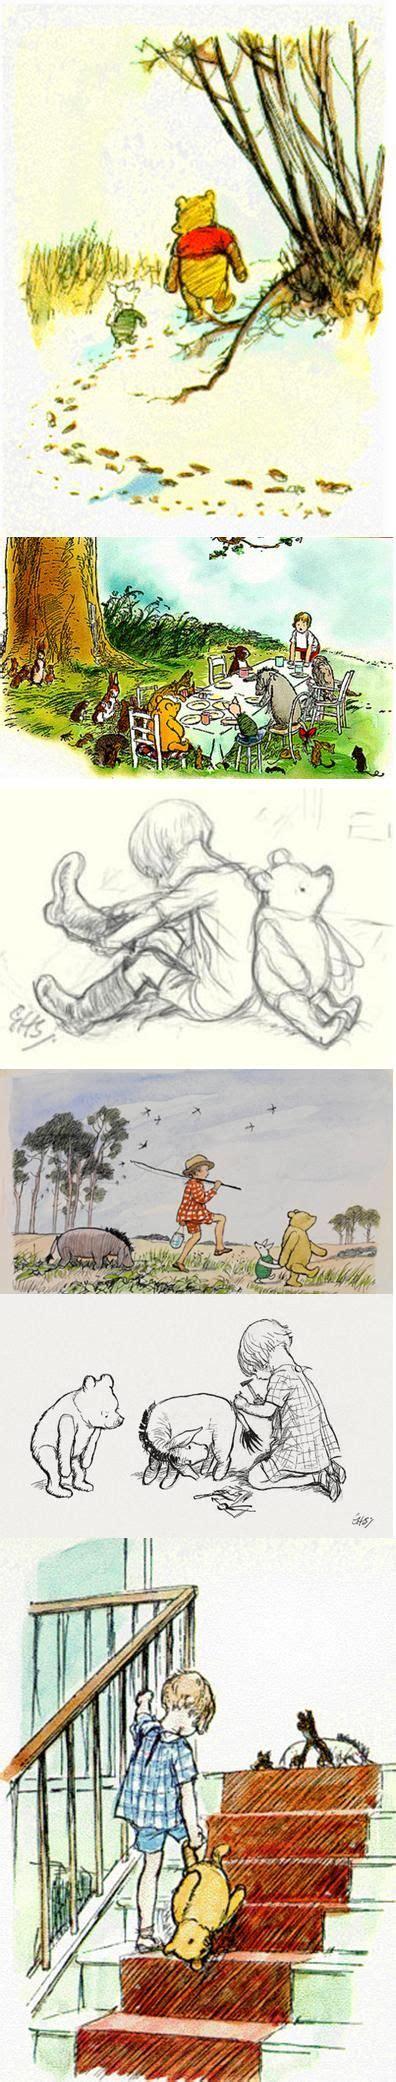 libro winny de puh winnie the pooh winnie the pooh pooh bear and bears on